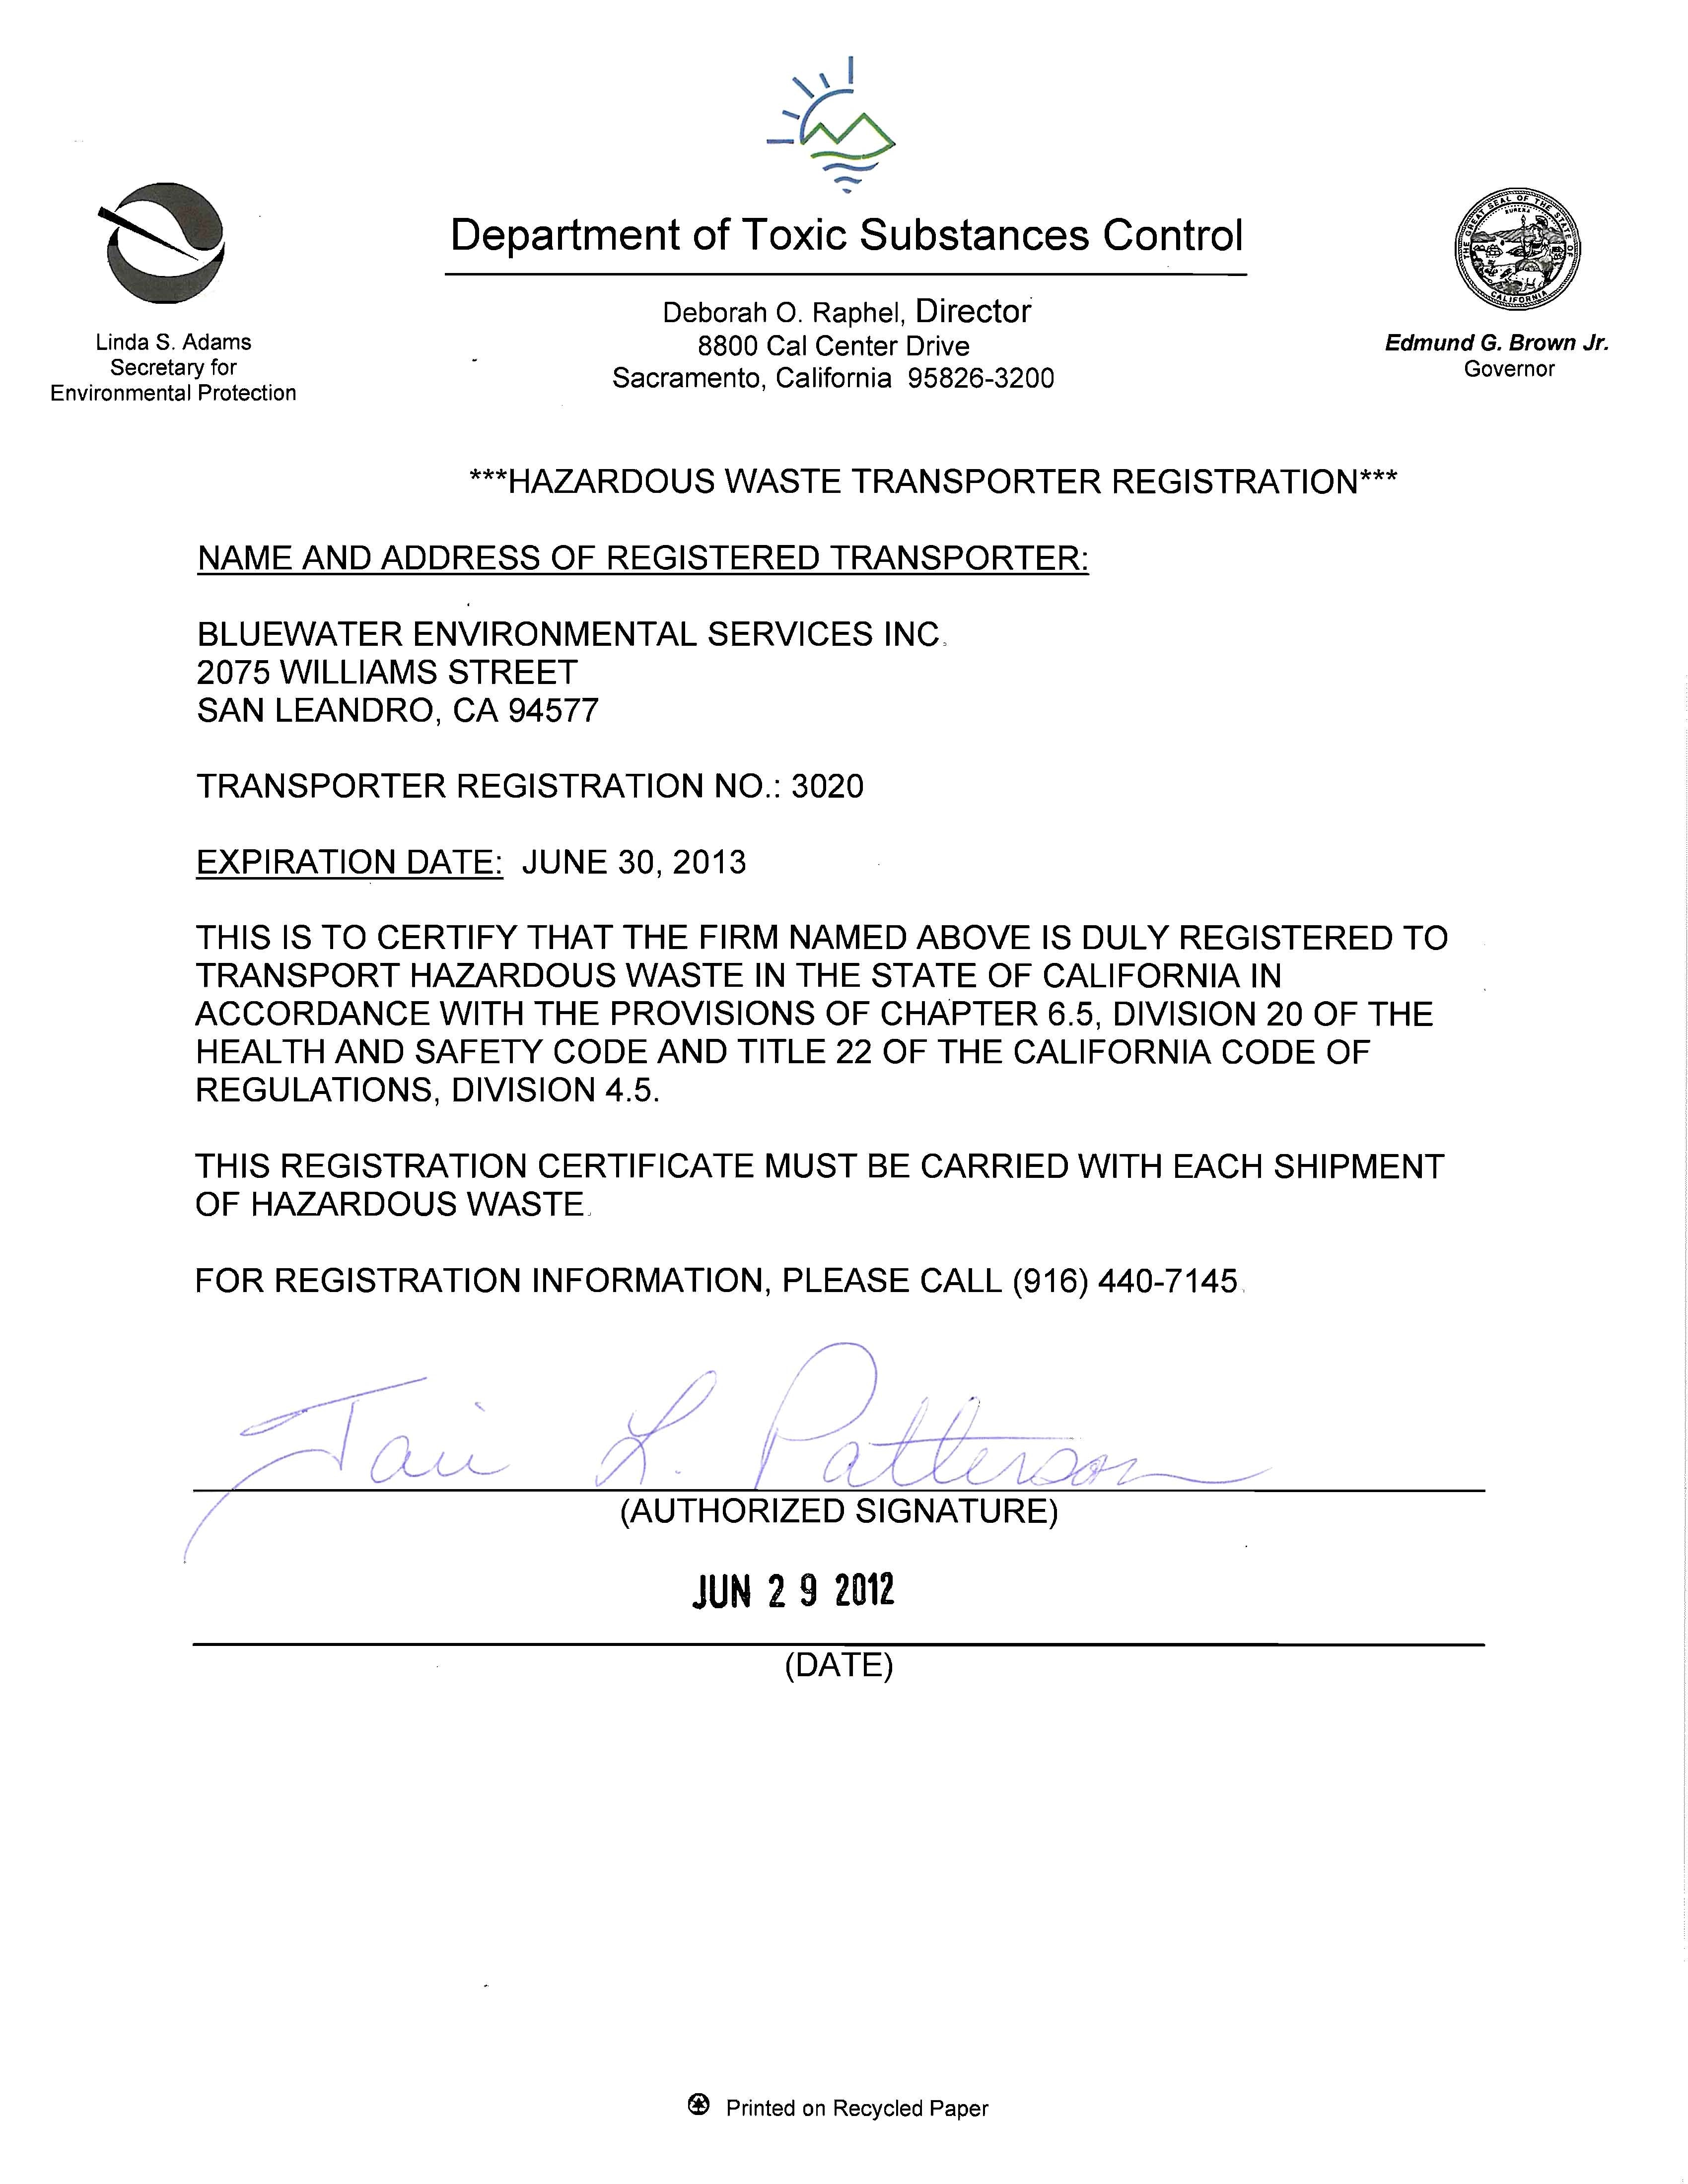 Hazardous Material Certificate of Registration